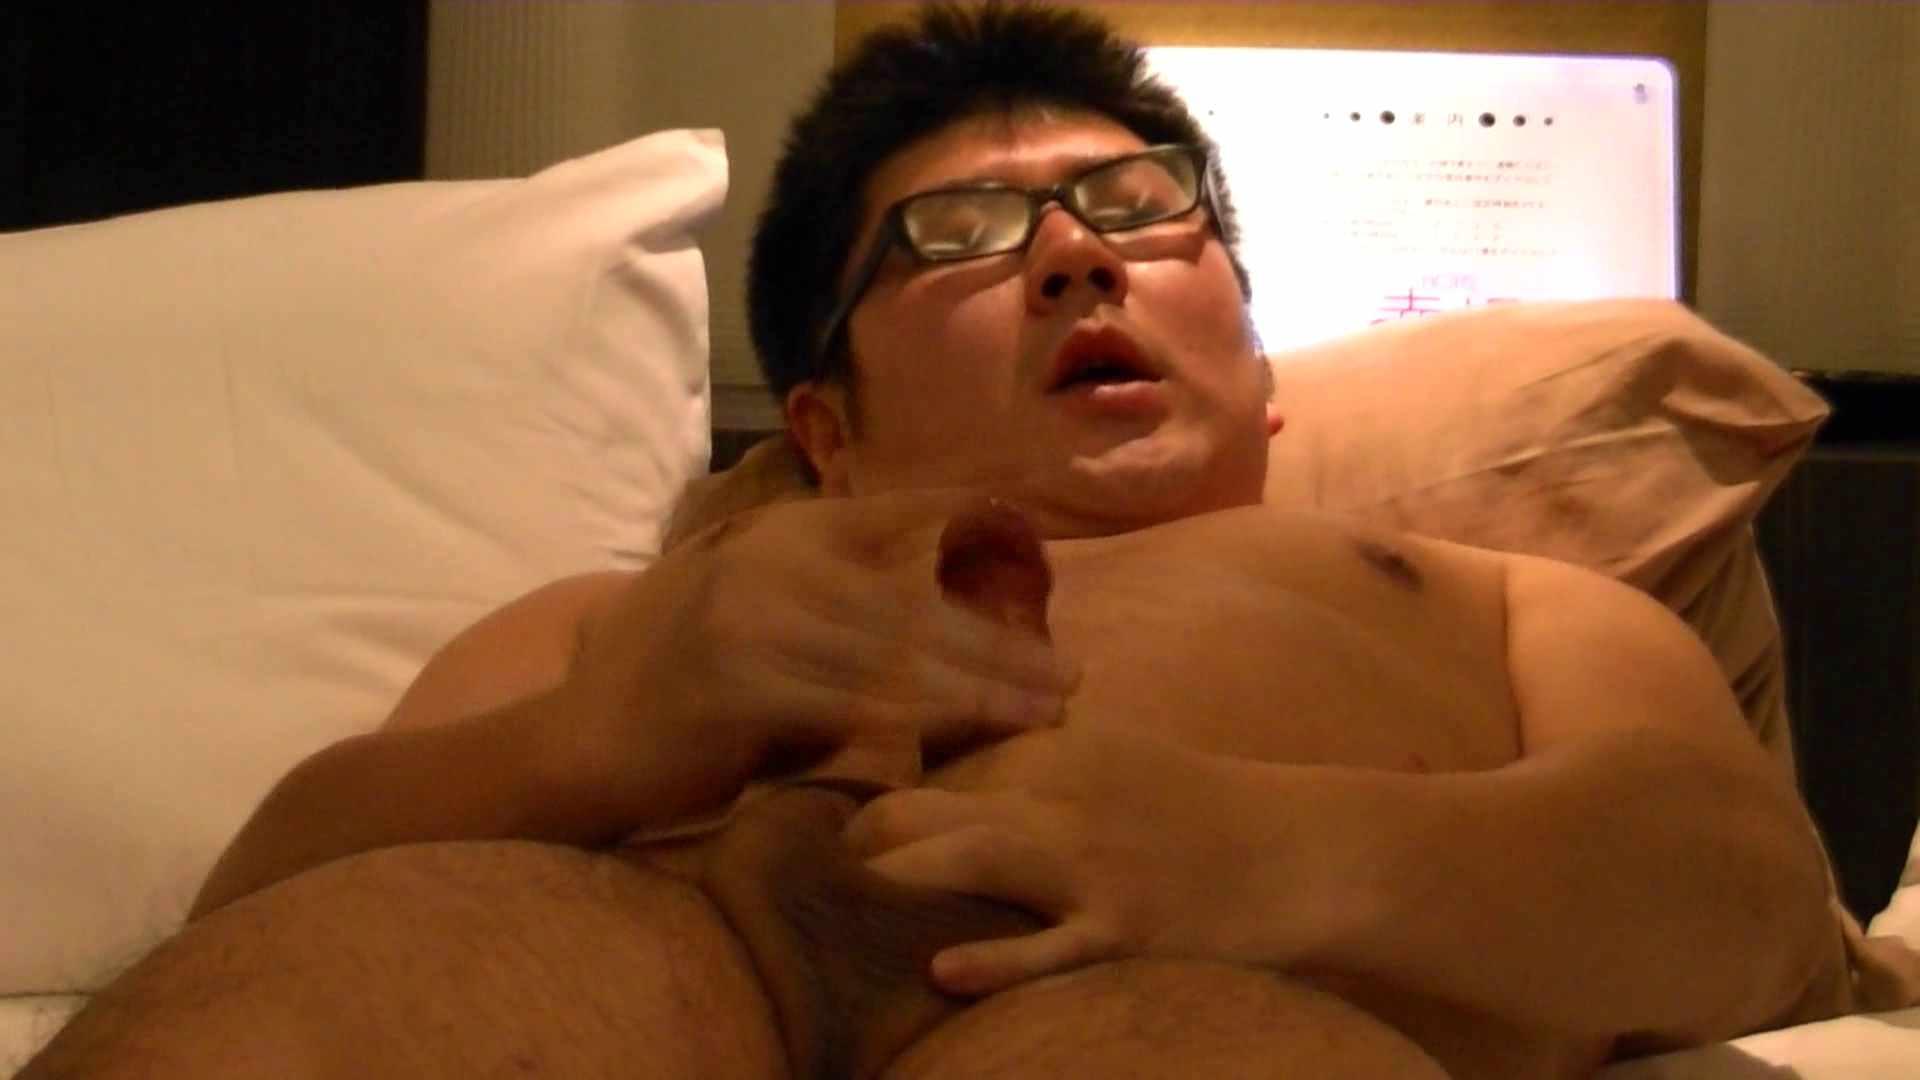 Mr.オナックスさん投稿!HD 貴方のオナニー三万円で撮影させてください。VOL.03 後編 オナニー編 ゲイAV画像 106枚 14